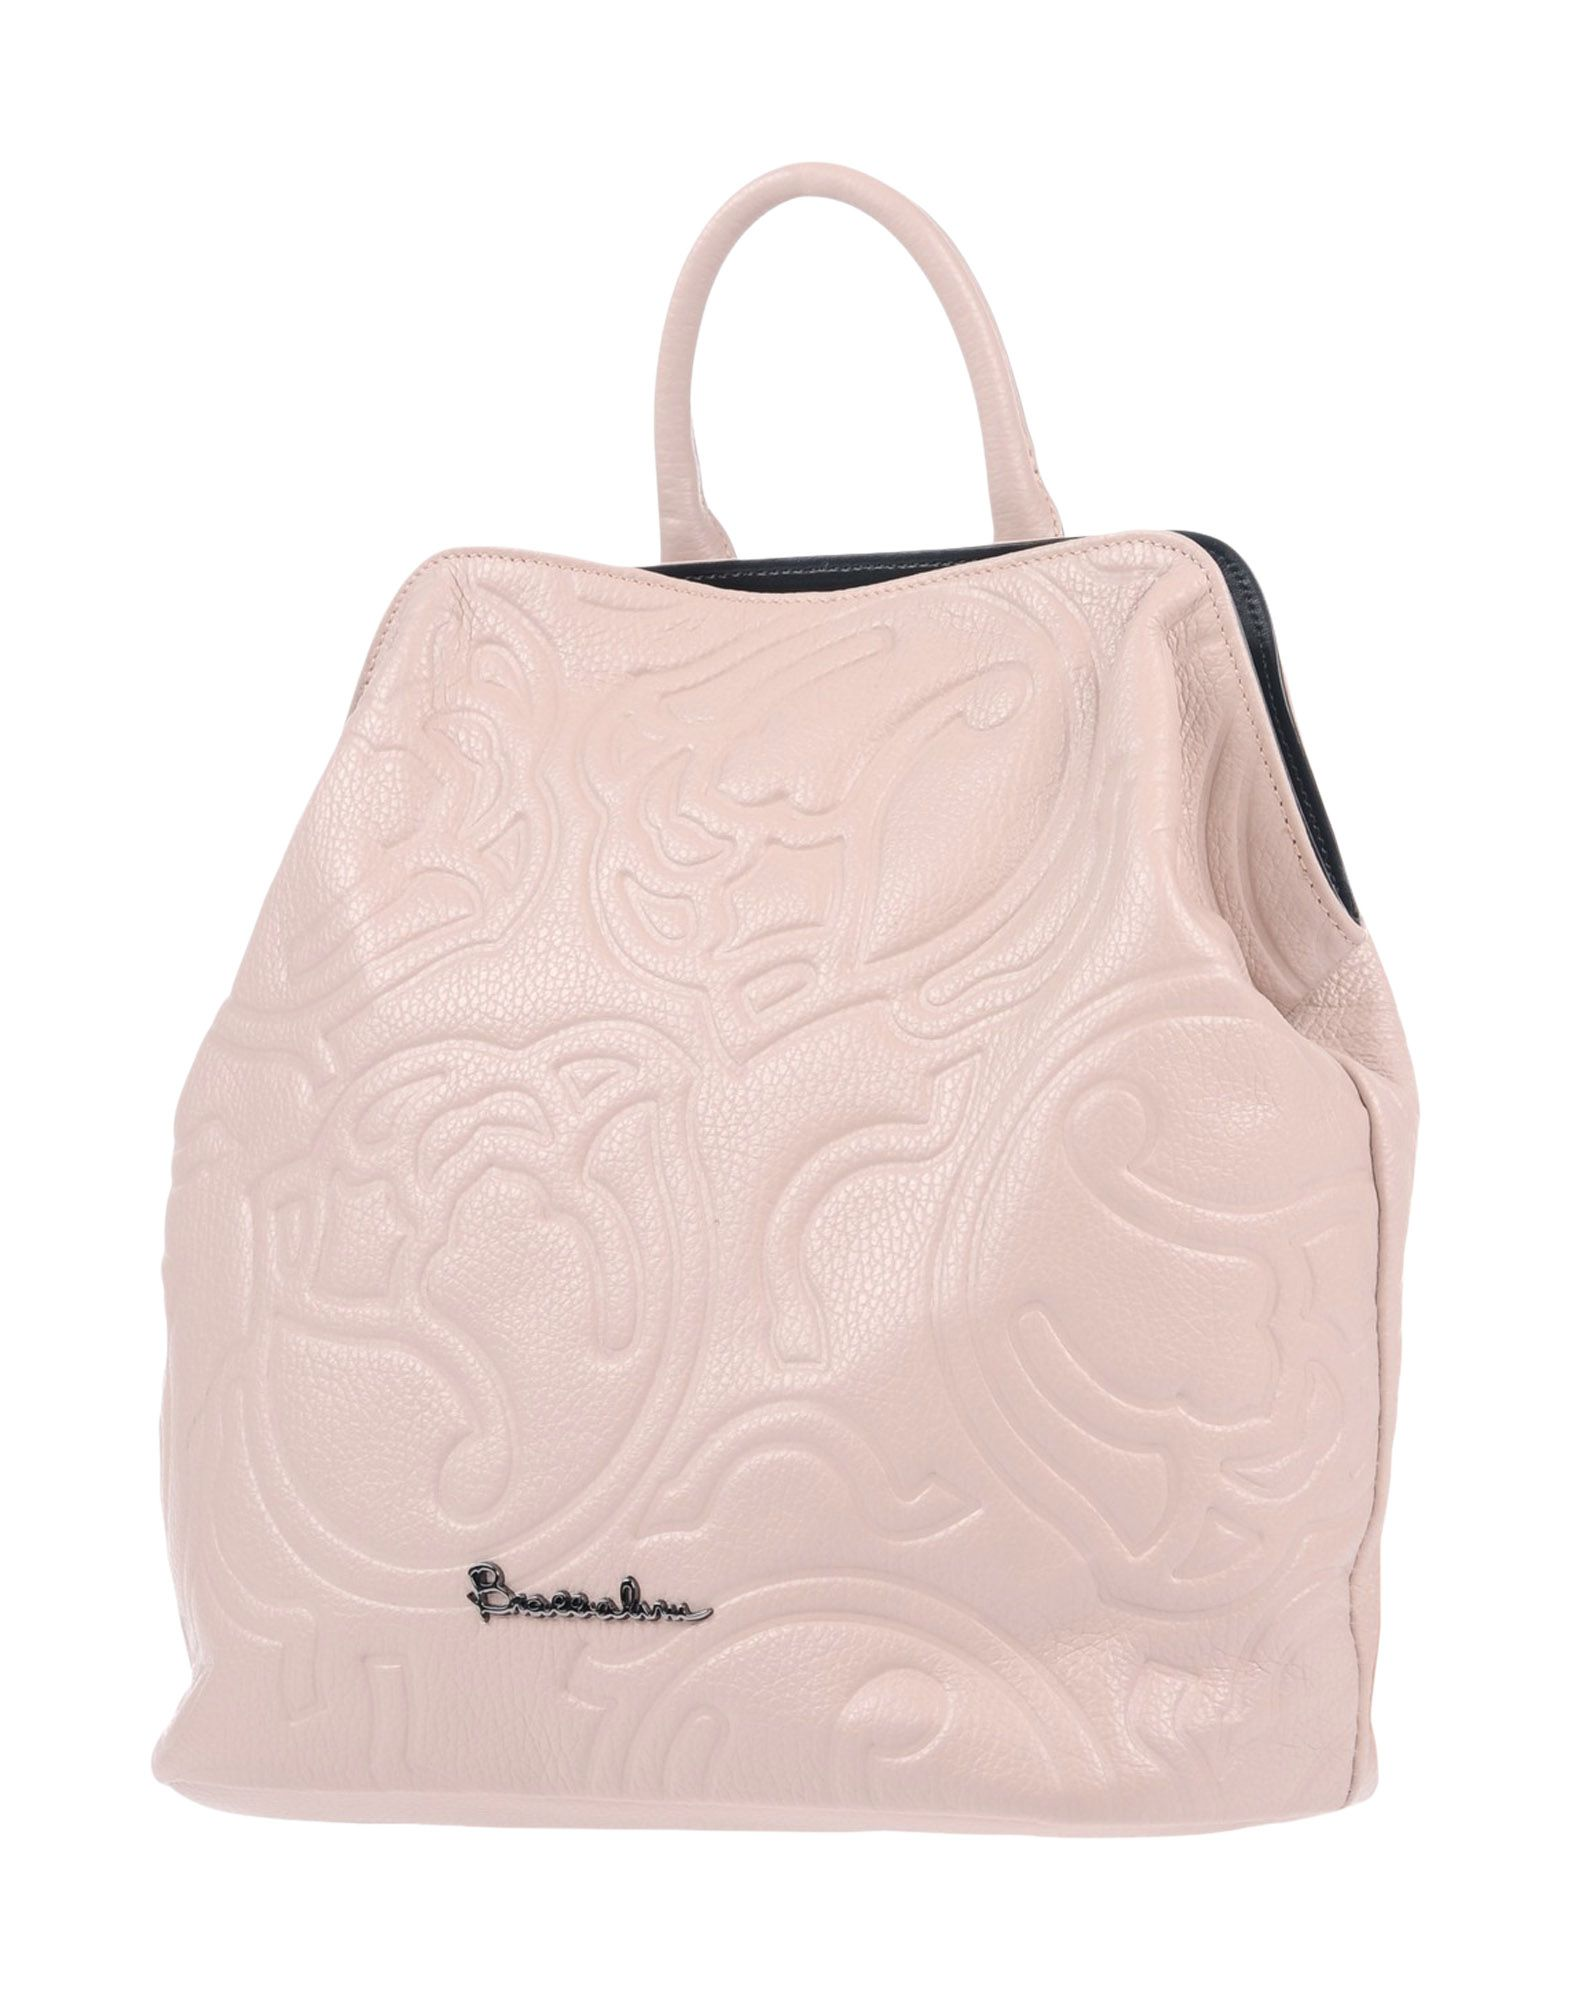 BRACCIALINI Рюкзаки и сумки на пояс женщины pu кожа сумочкакожаные сумки messenge